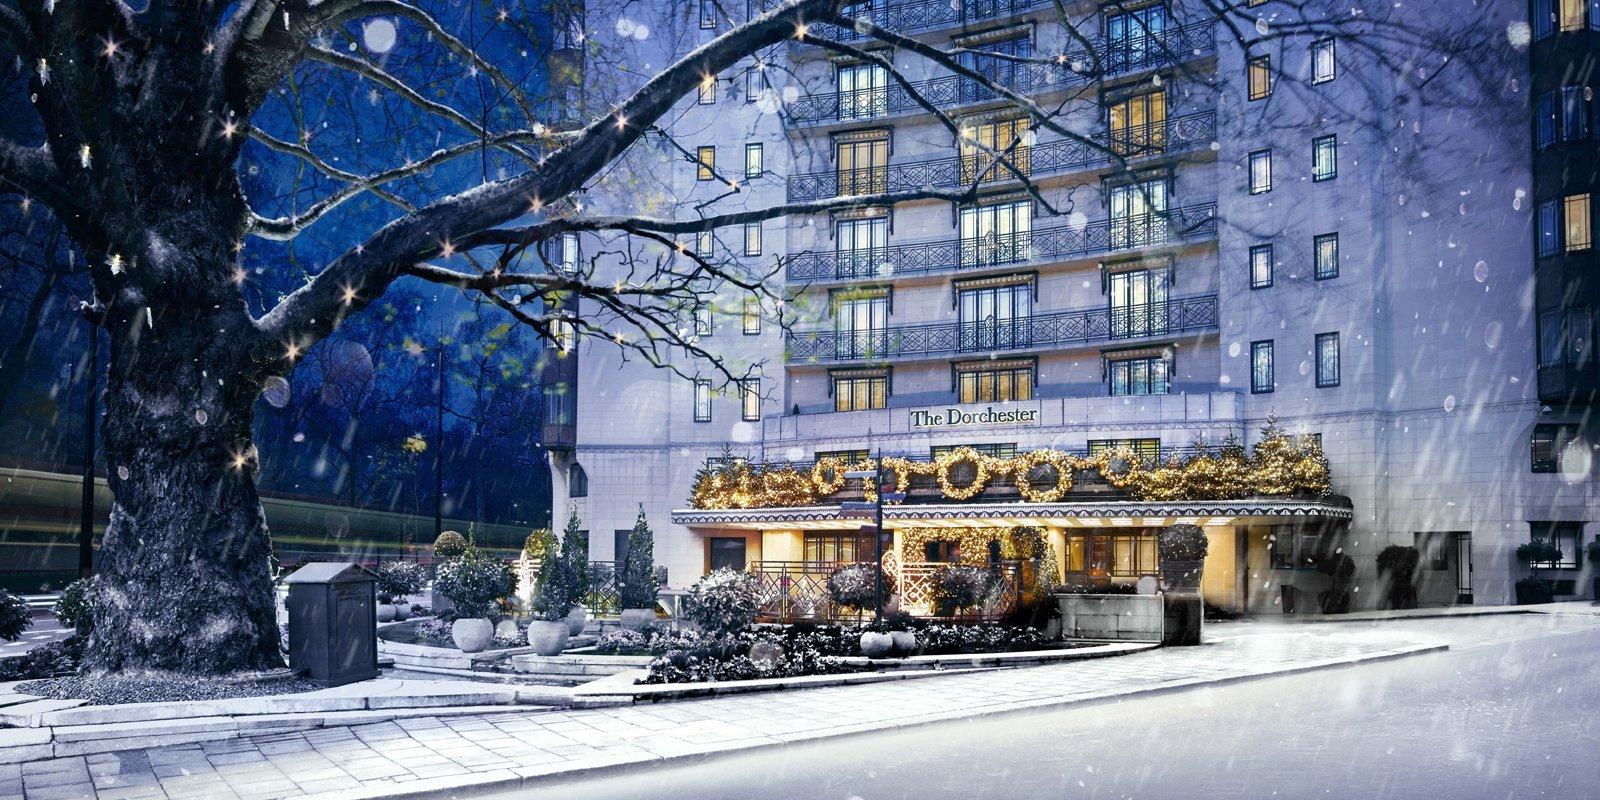 the-dorchester-hotel-christmas-exterior